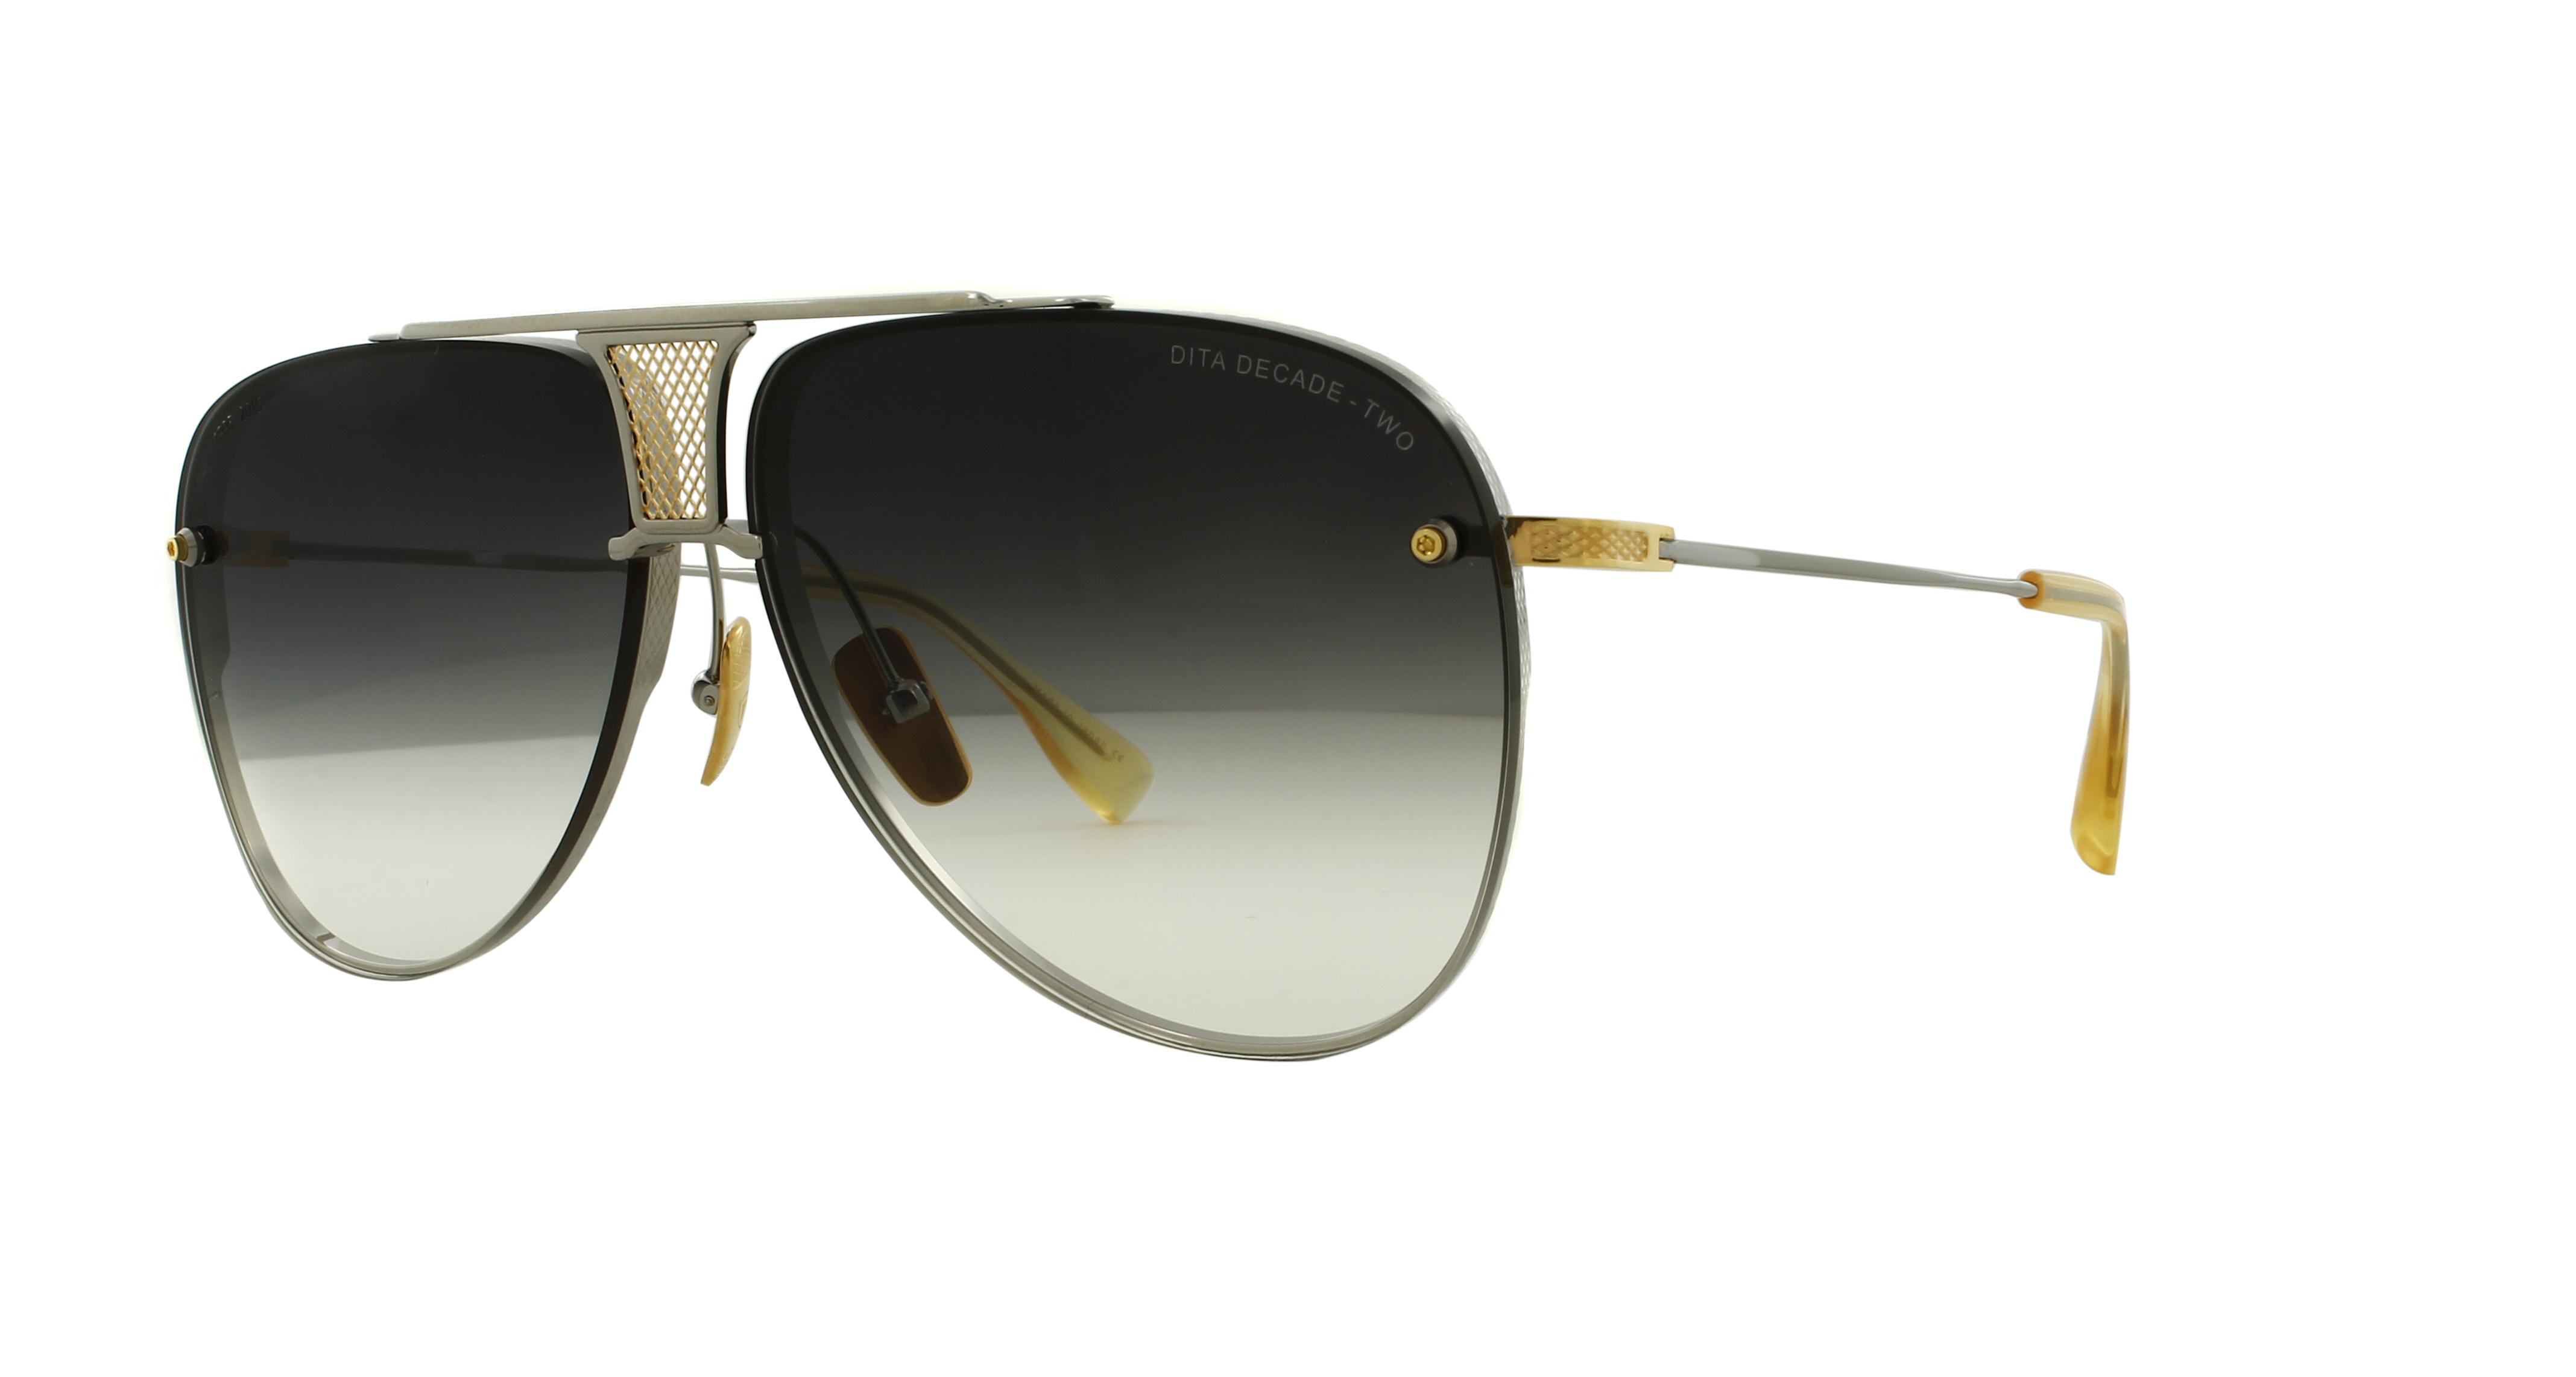 5b8fecb1d0f2 Dita Sunglasses - Discount Designer Sunglasses